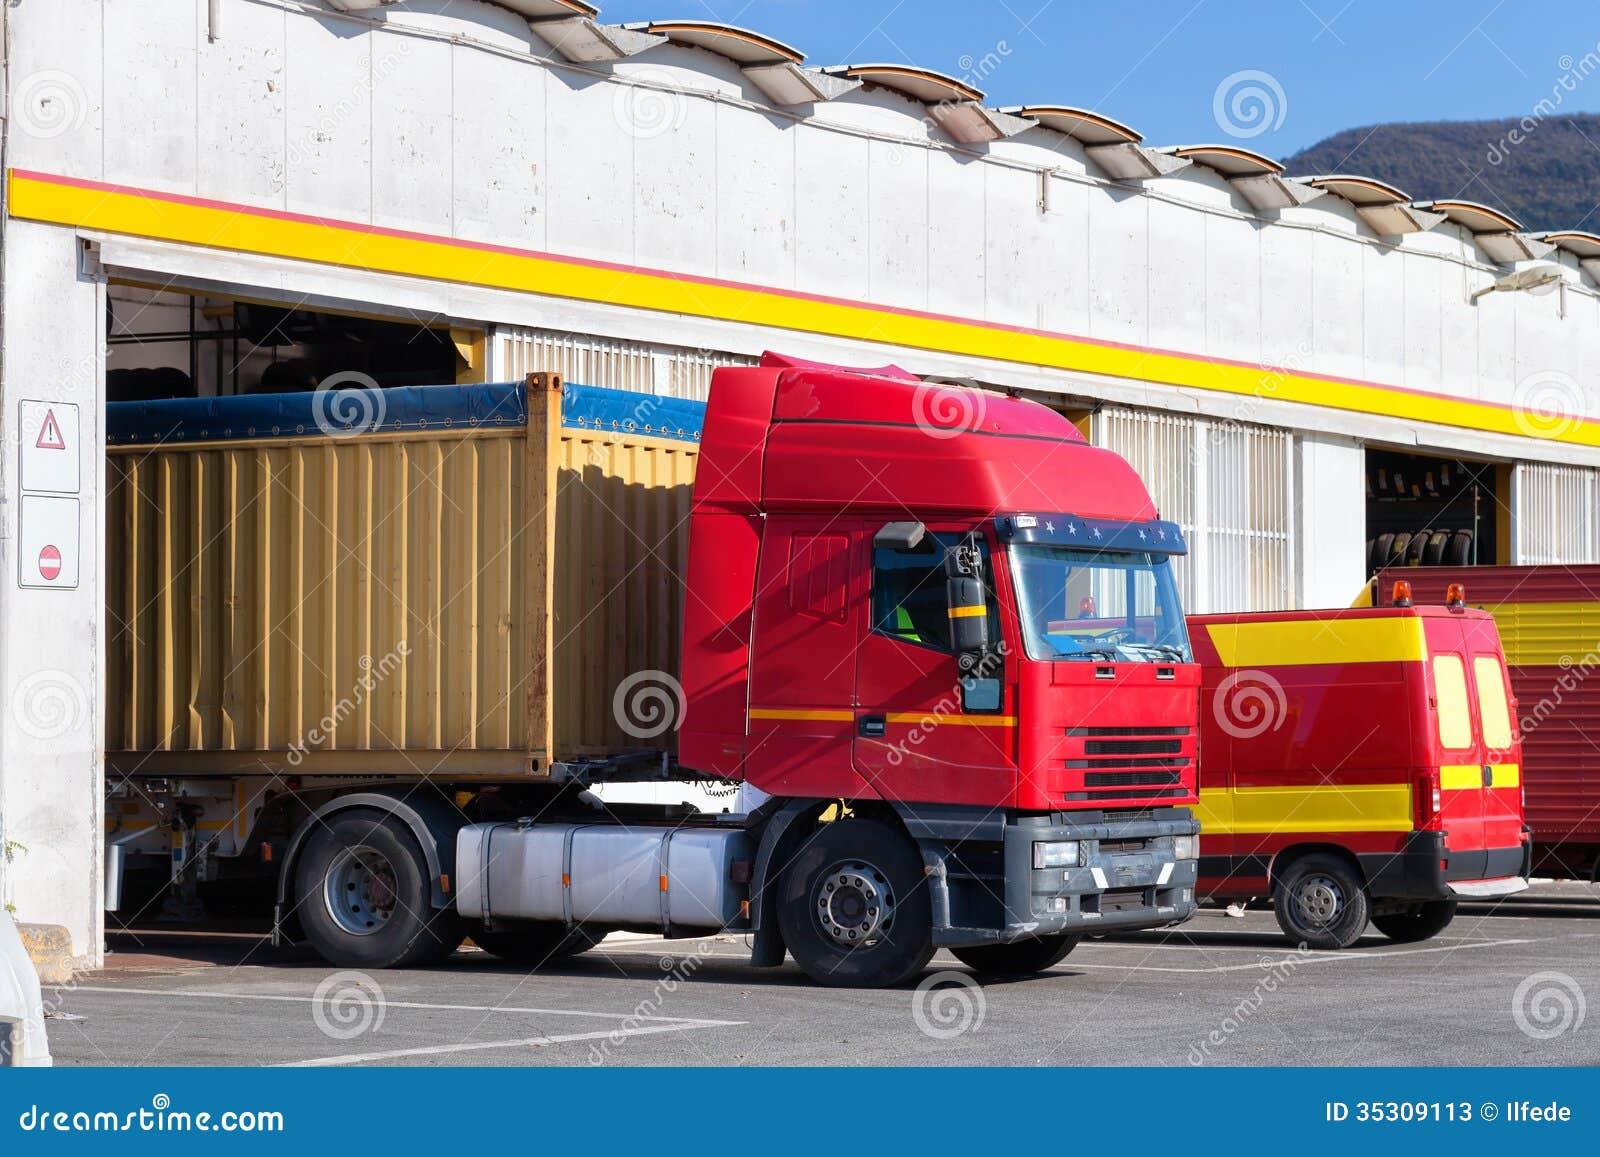 Garage For Service Trucks : Exterior of truck service garage stock photos image